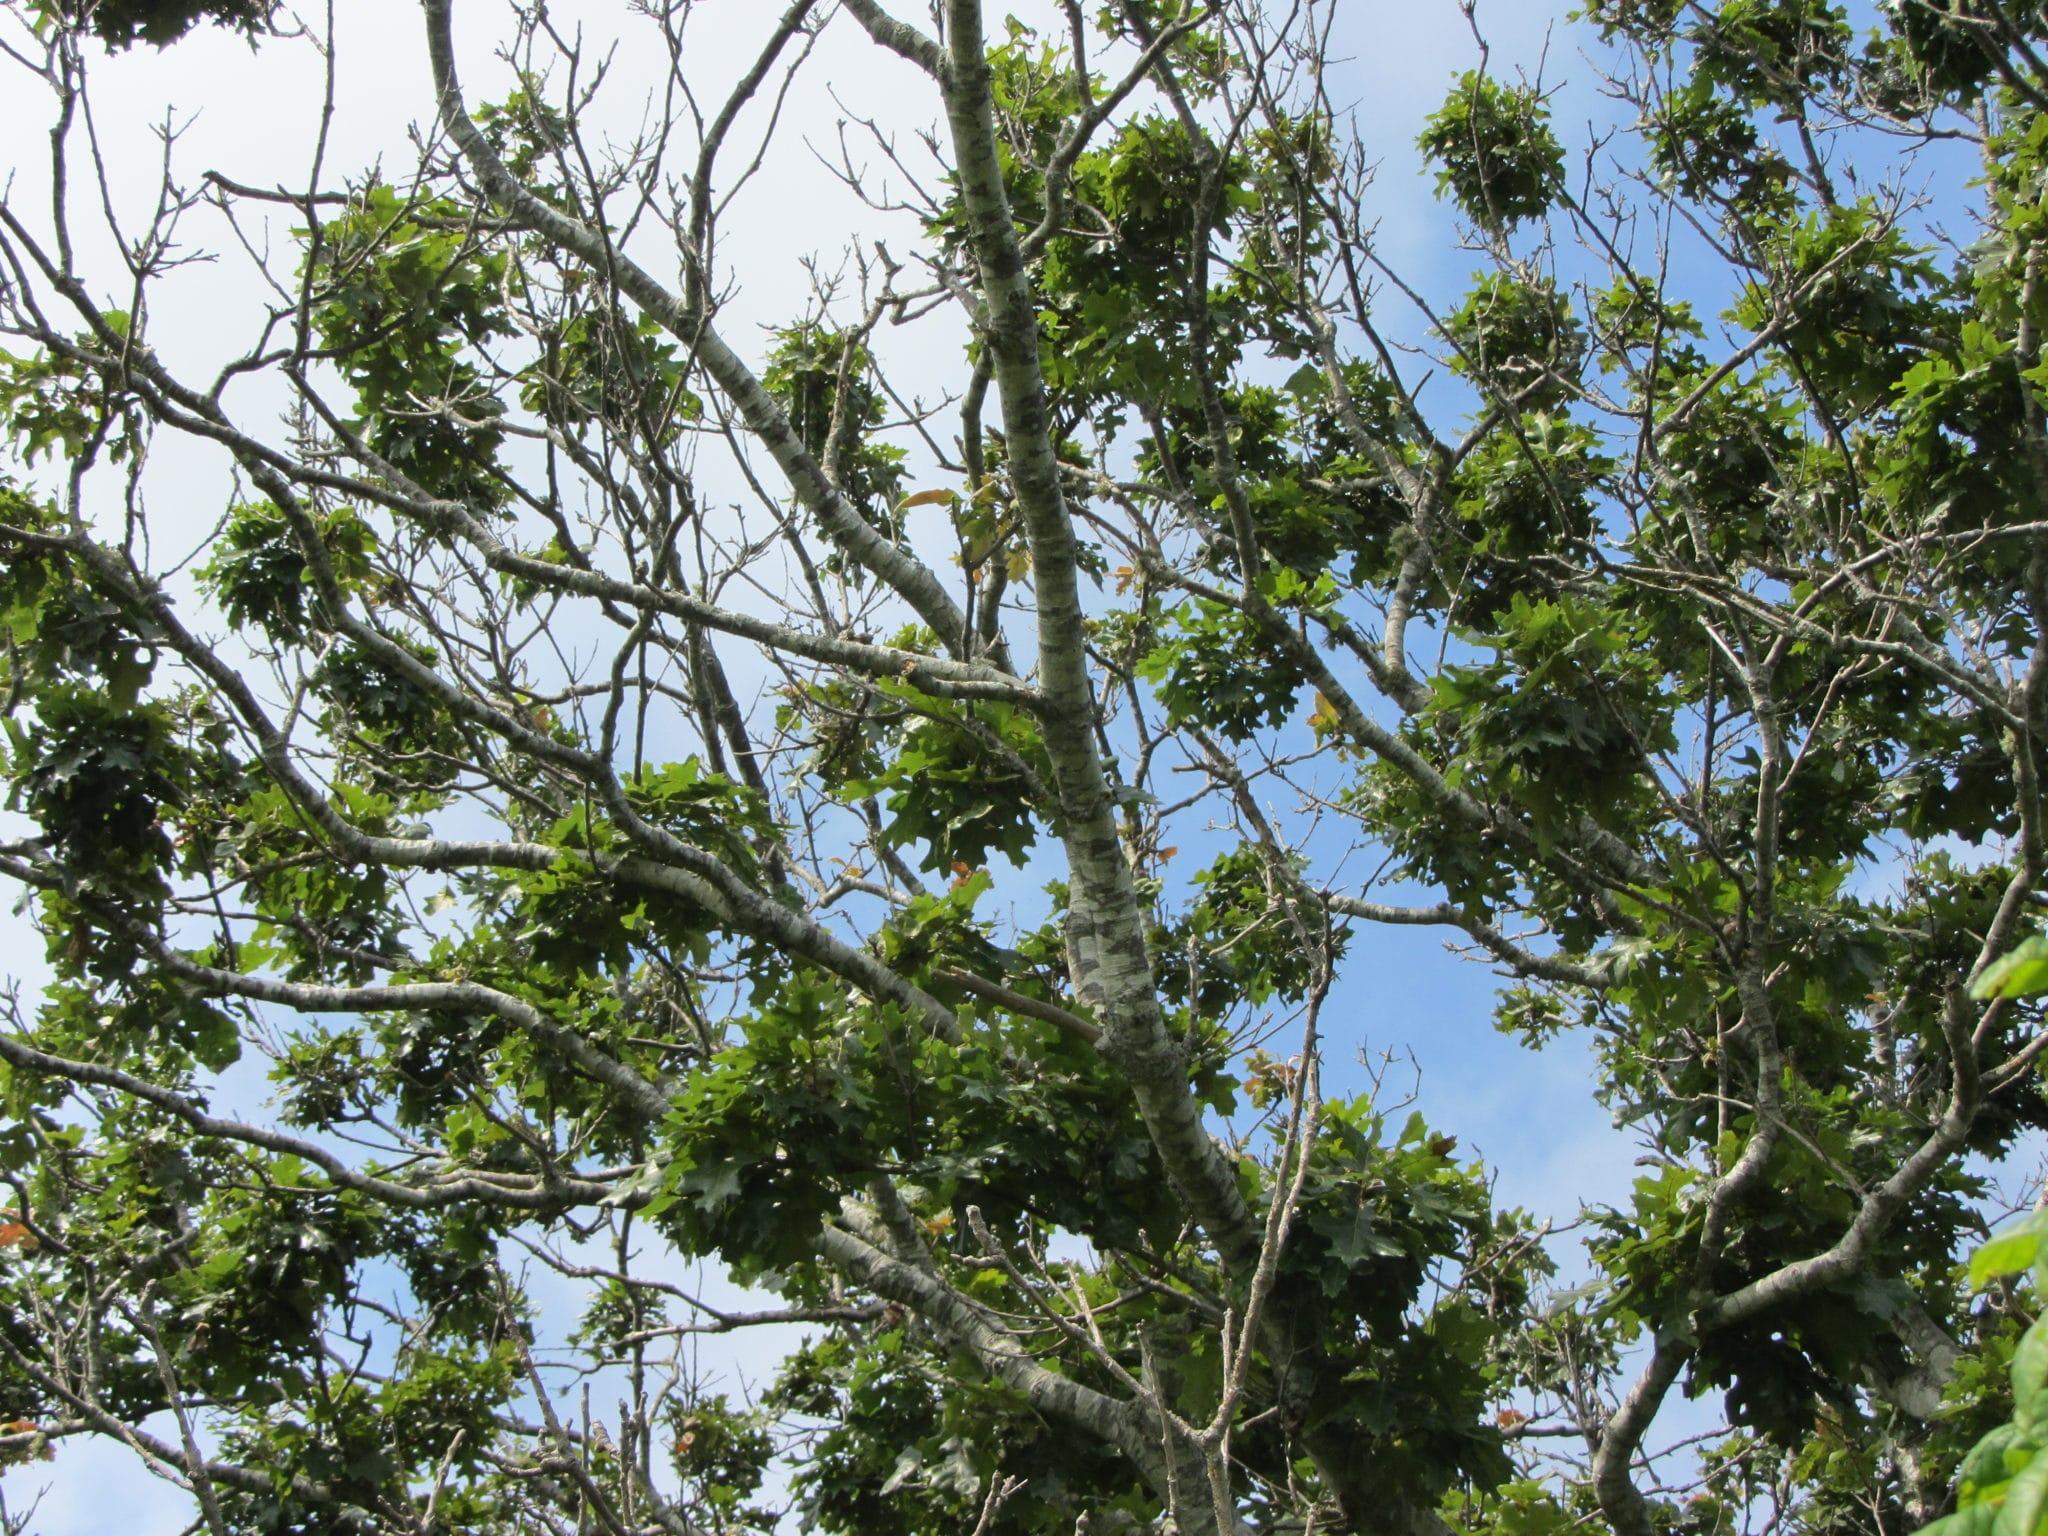 2. Black Oak Canopy Gall Wasp Damage